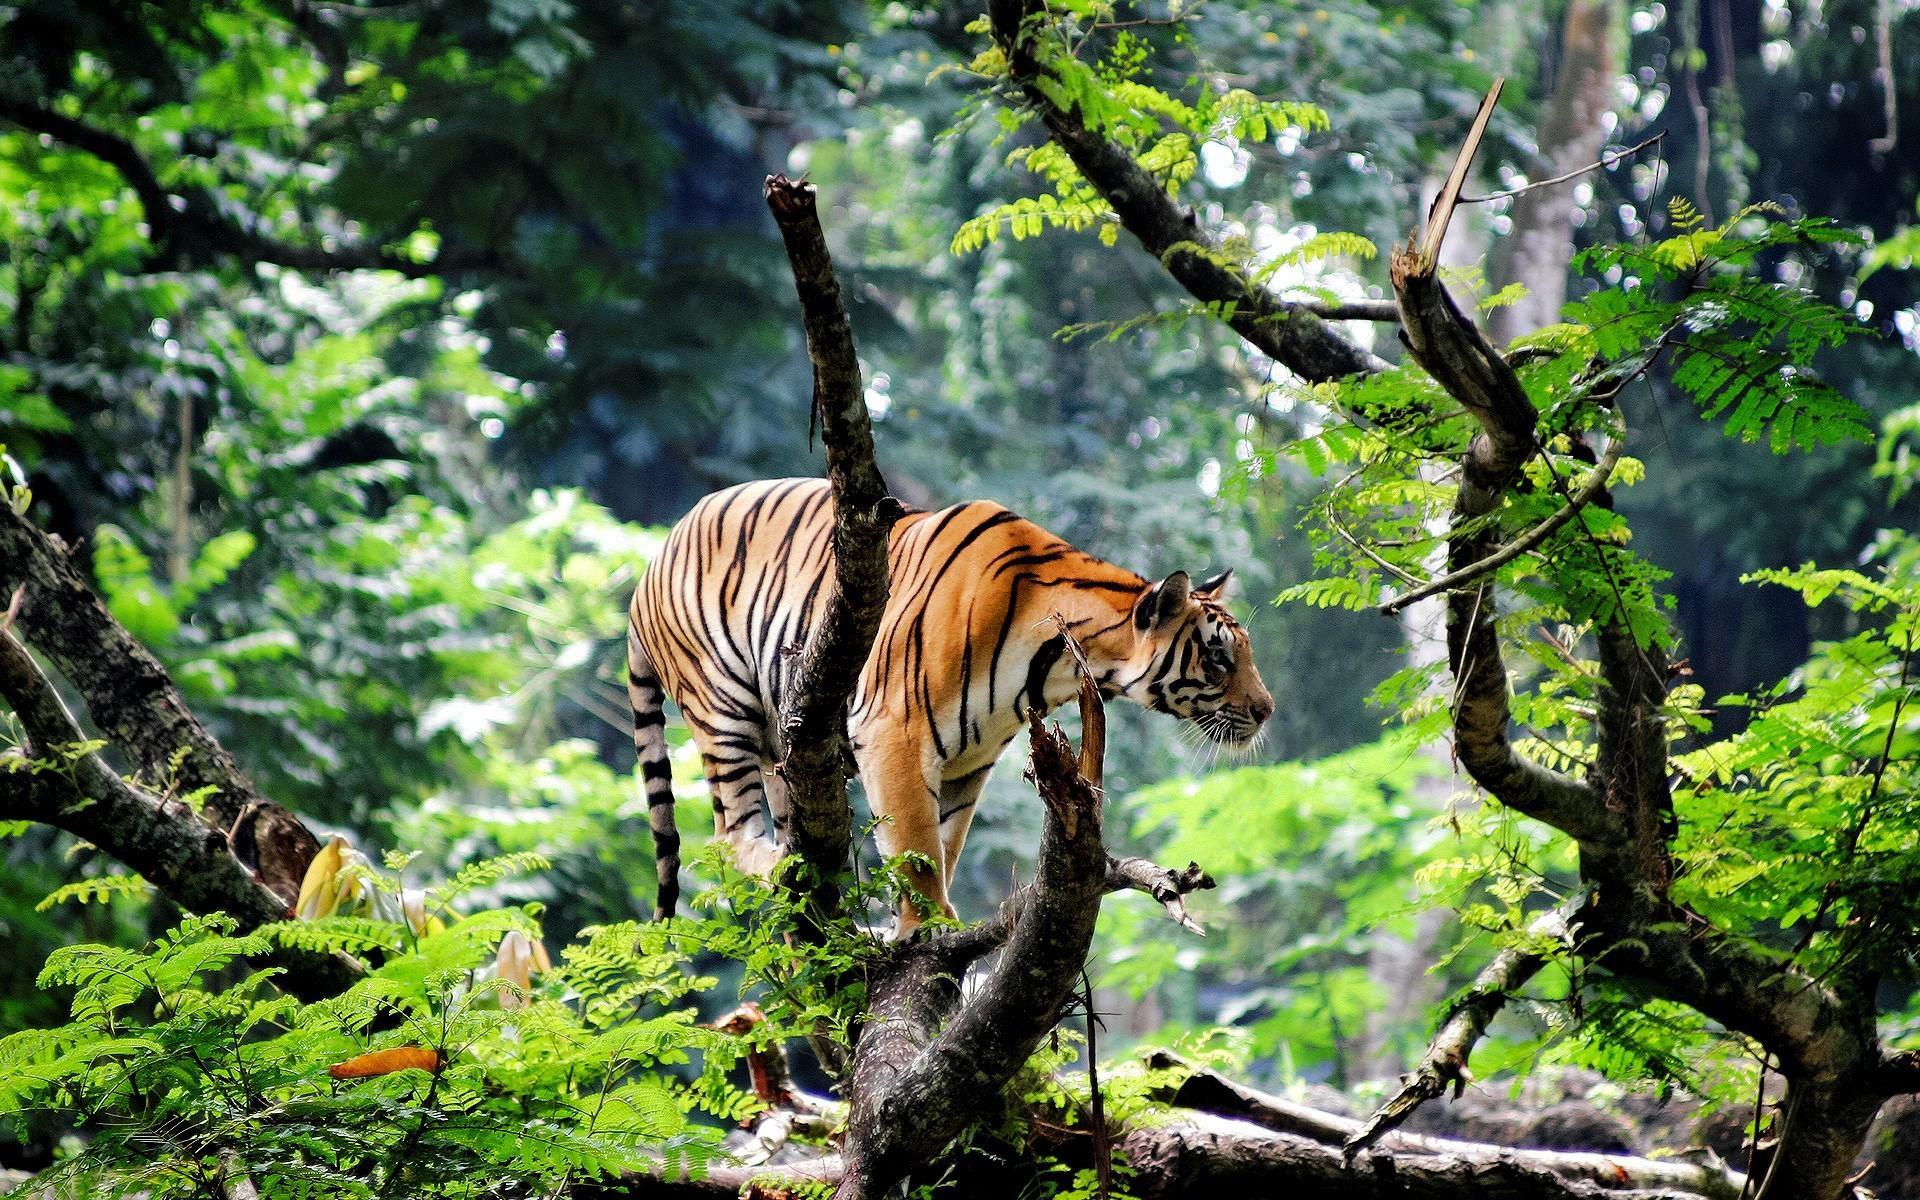 fond d 39 cran des arbres animaux la nature les plantes tigre branche faune gros chats. Black Bedroom Furniture Sets. Home Design Ideas